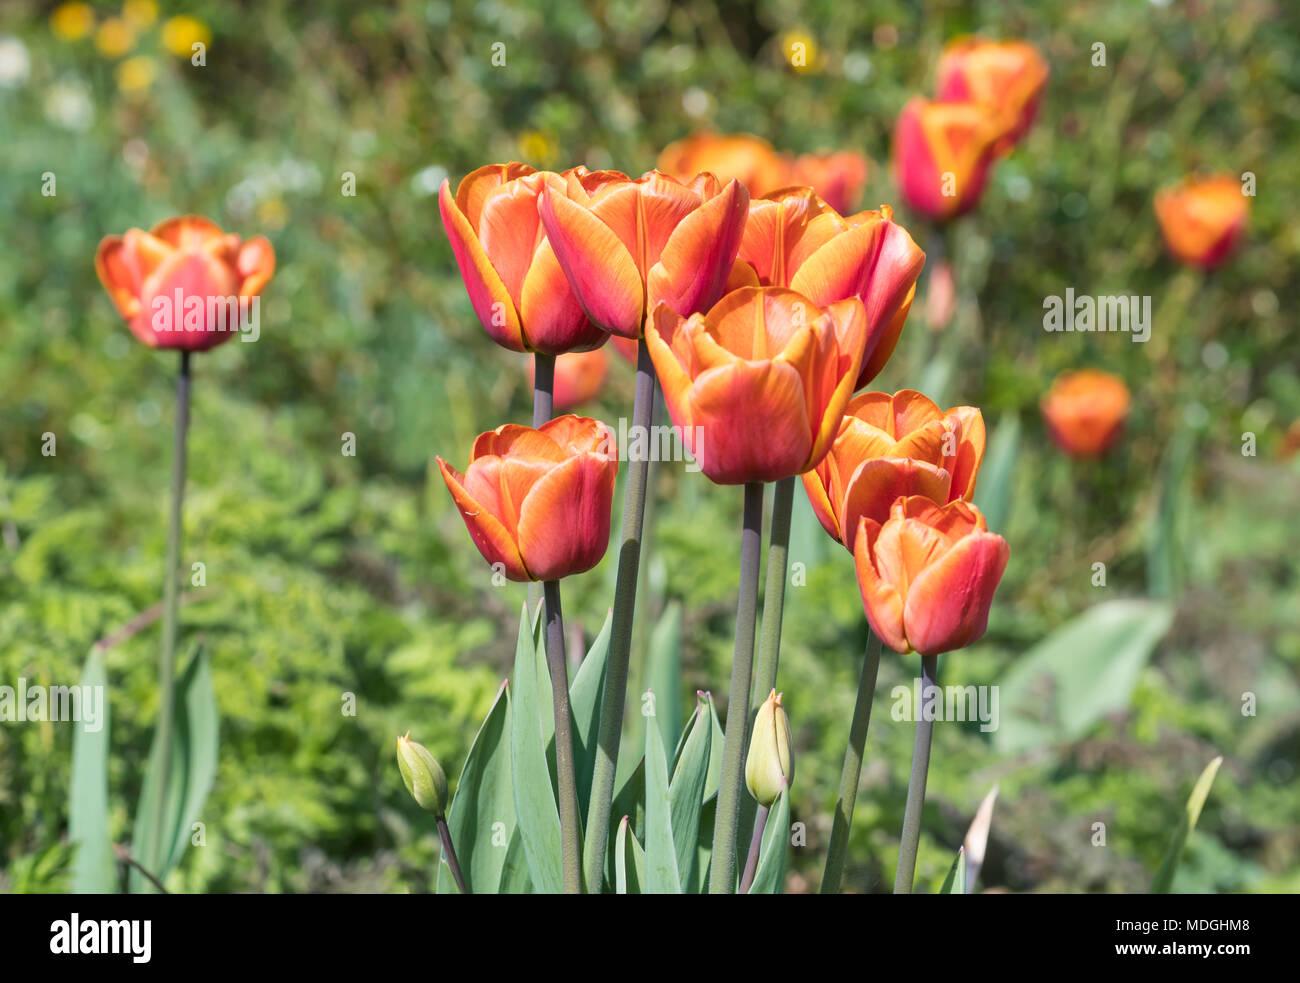 2 tone orange red Garden Tulips (Tulipa gesneriana, Didier's tulip) blooming in Spring in the UK. - Stock Image